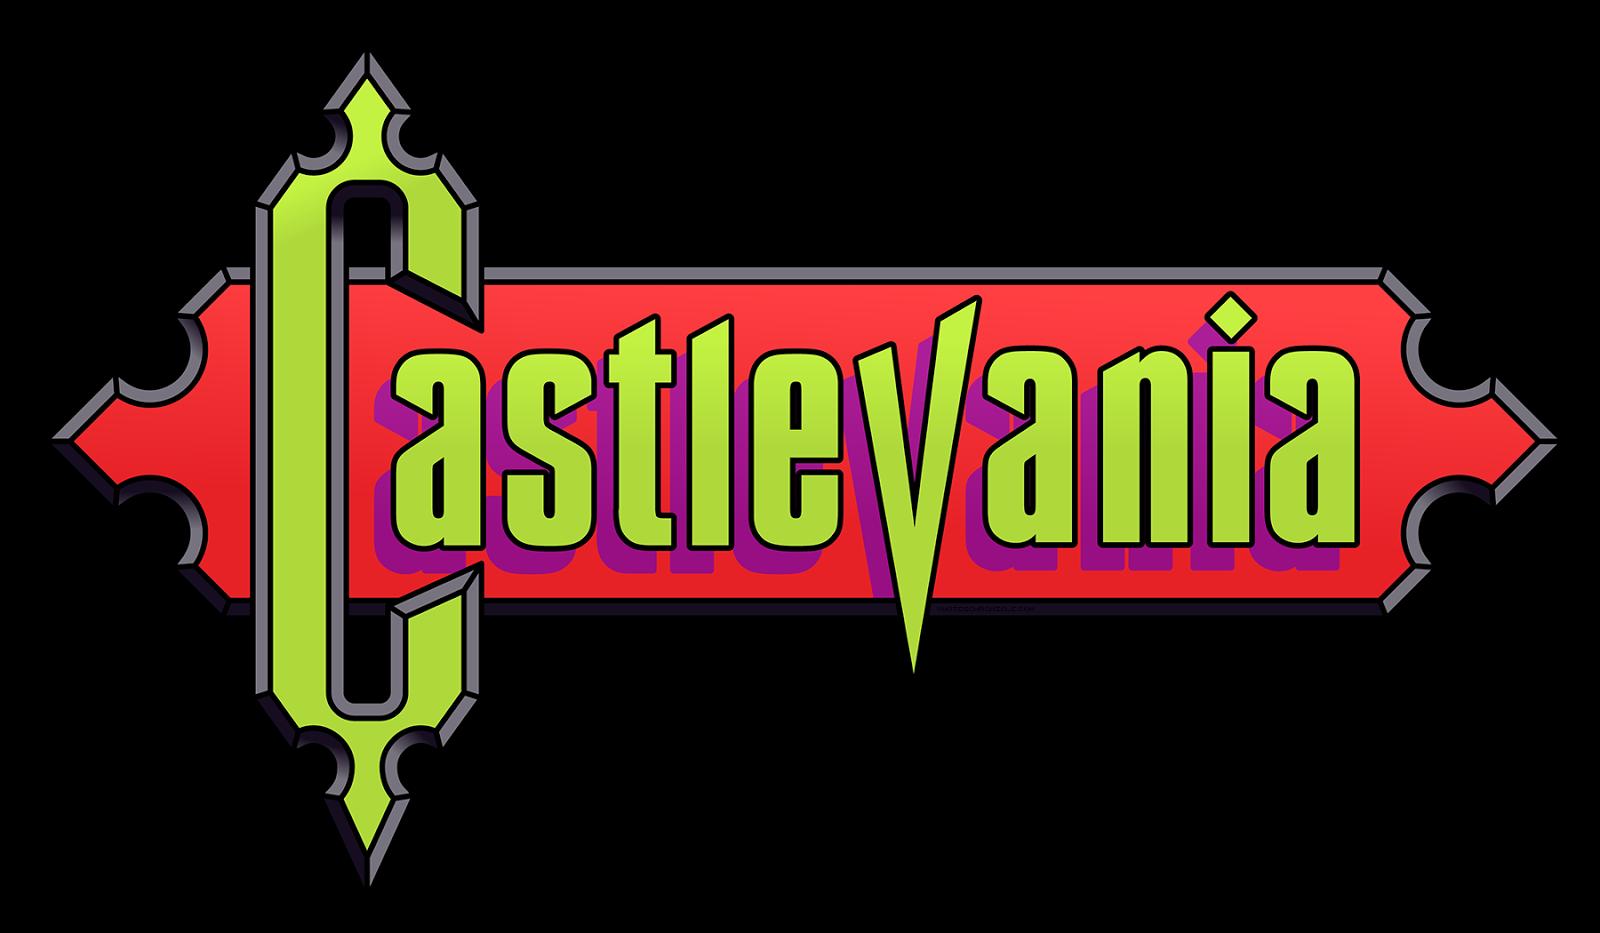 Programa 7x20 (28-02-2014) Especial Castlevania Parte 2 Castlevania_logo_color